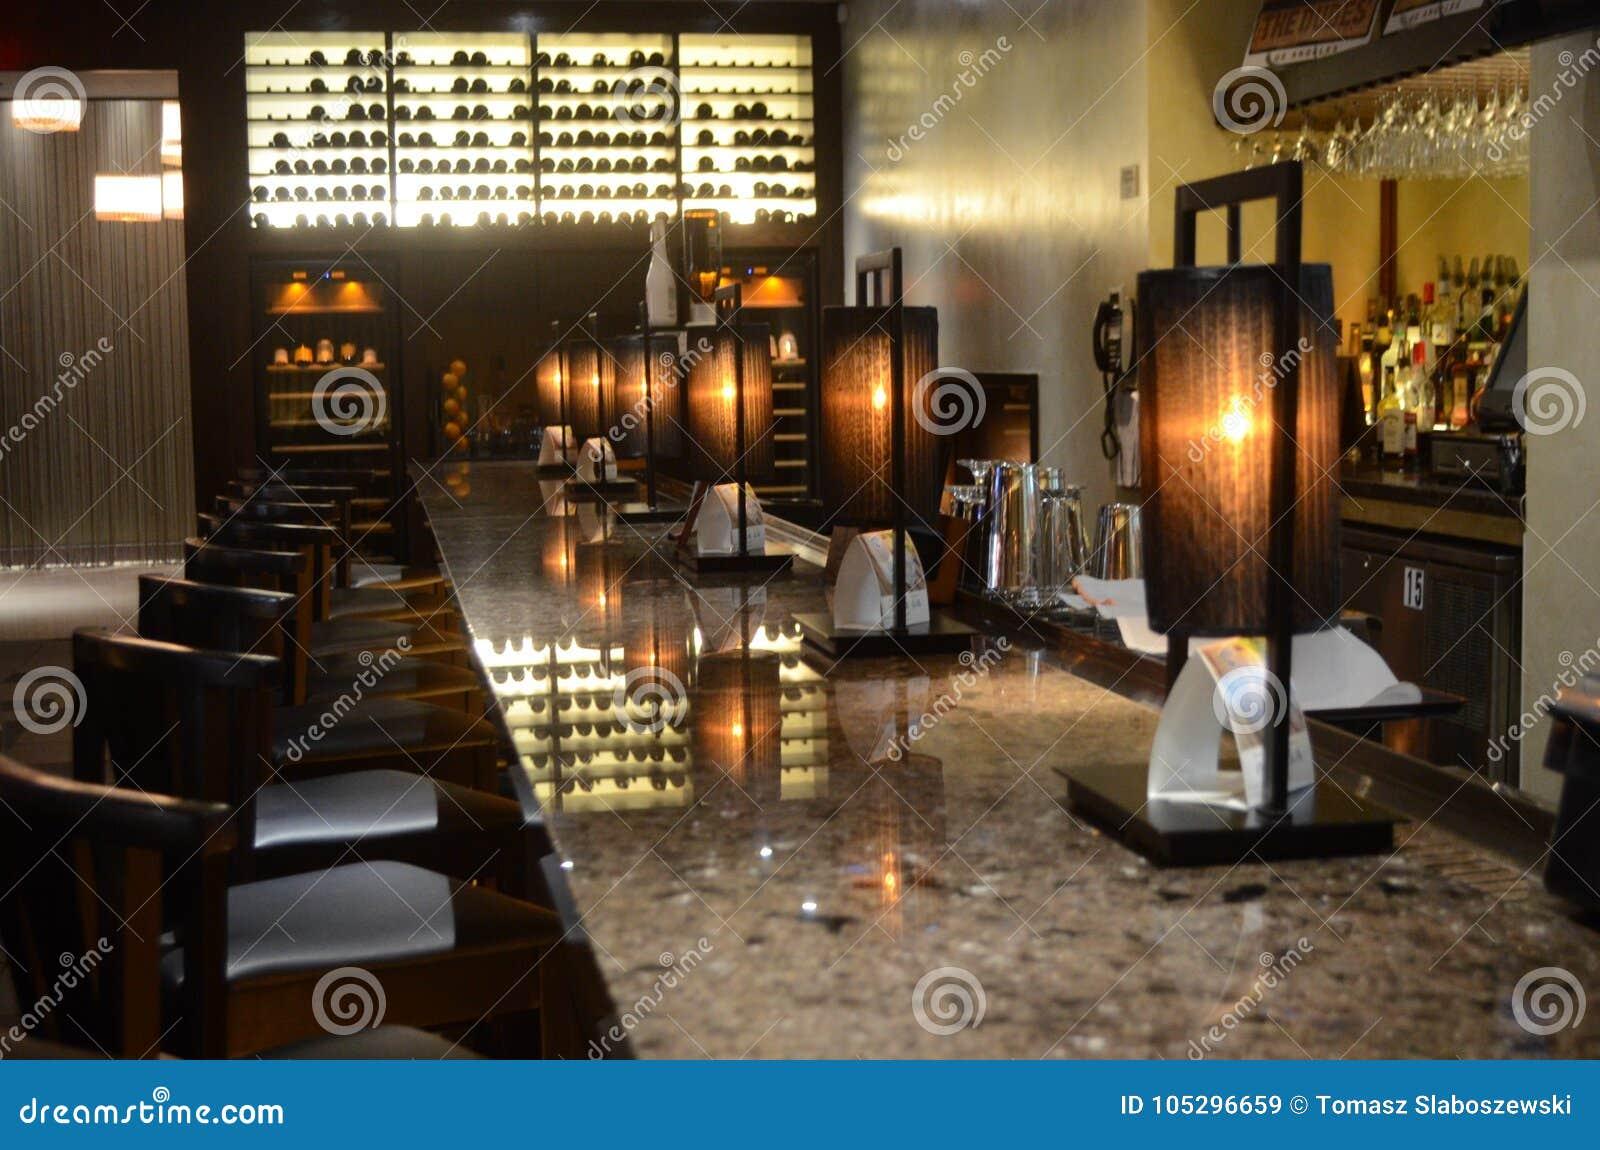 Japanese Sushi Restaurant Interior Design Bar Stock Image Image Of California Beverage 105296659